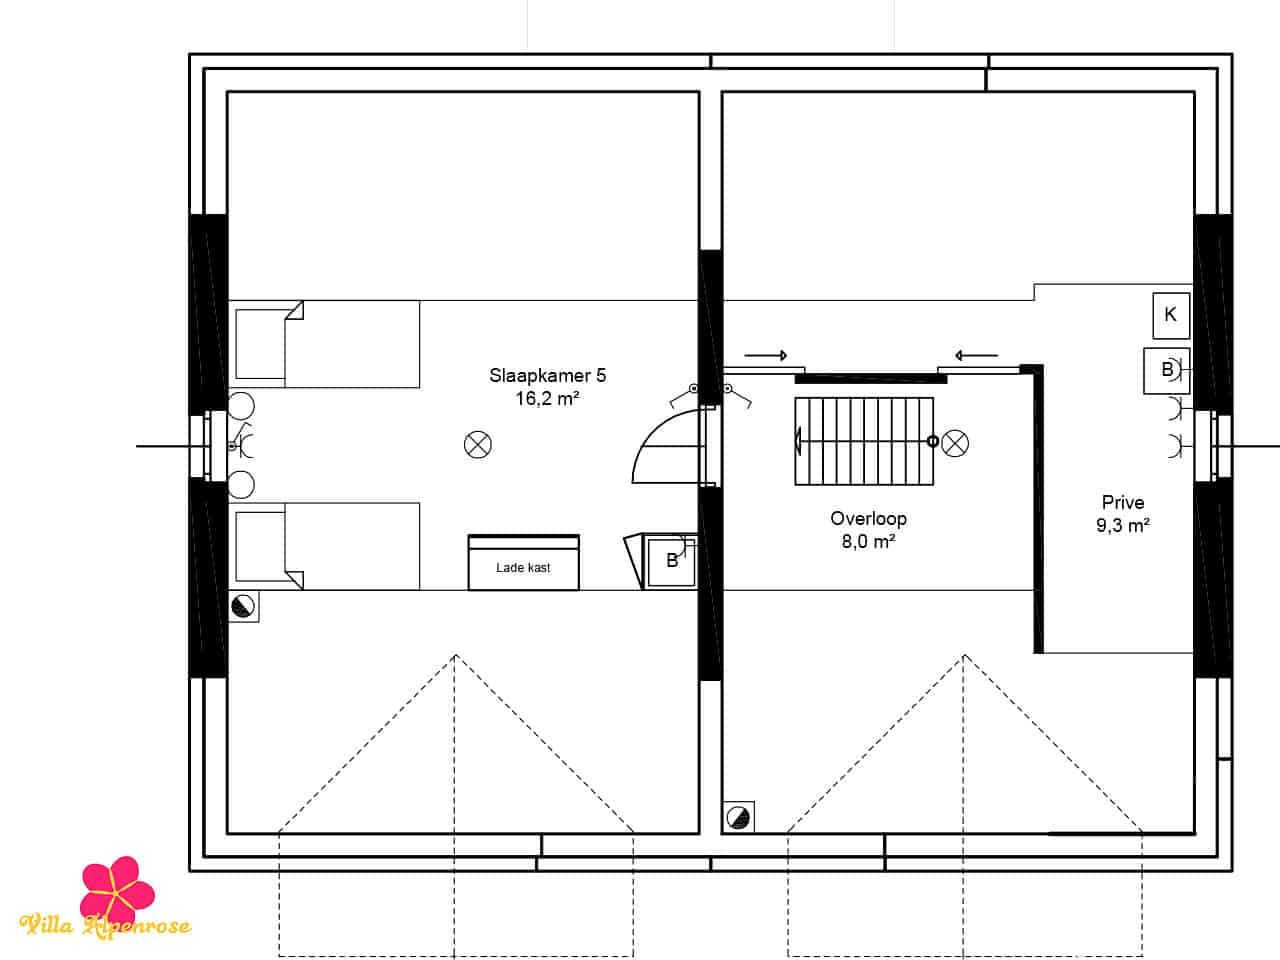 villa-alpenrose-plattegrond-zolder